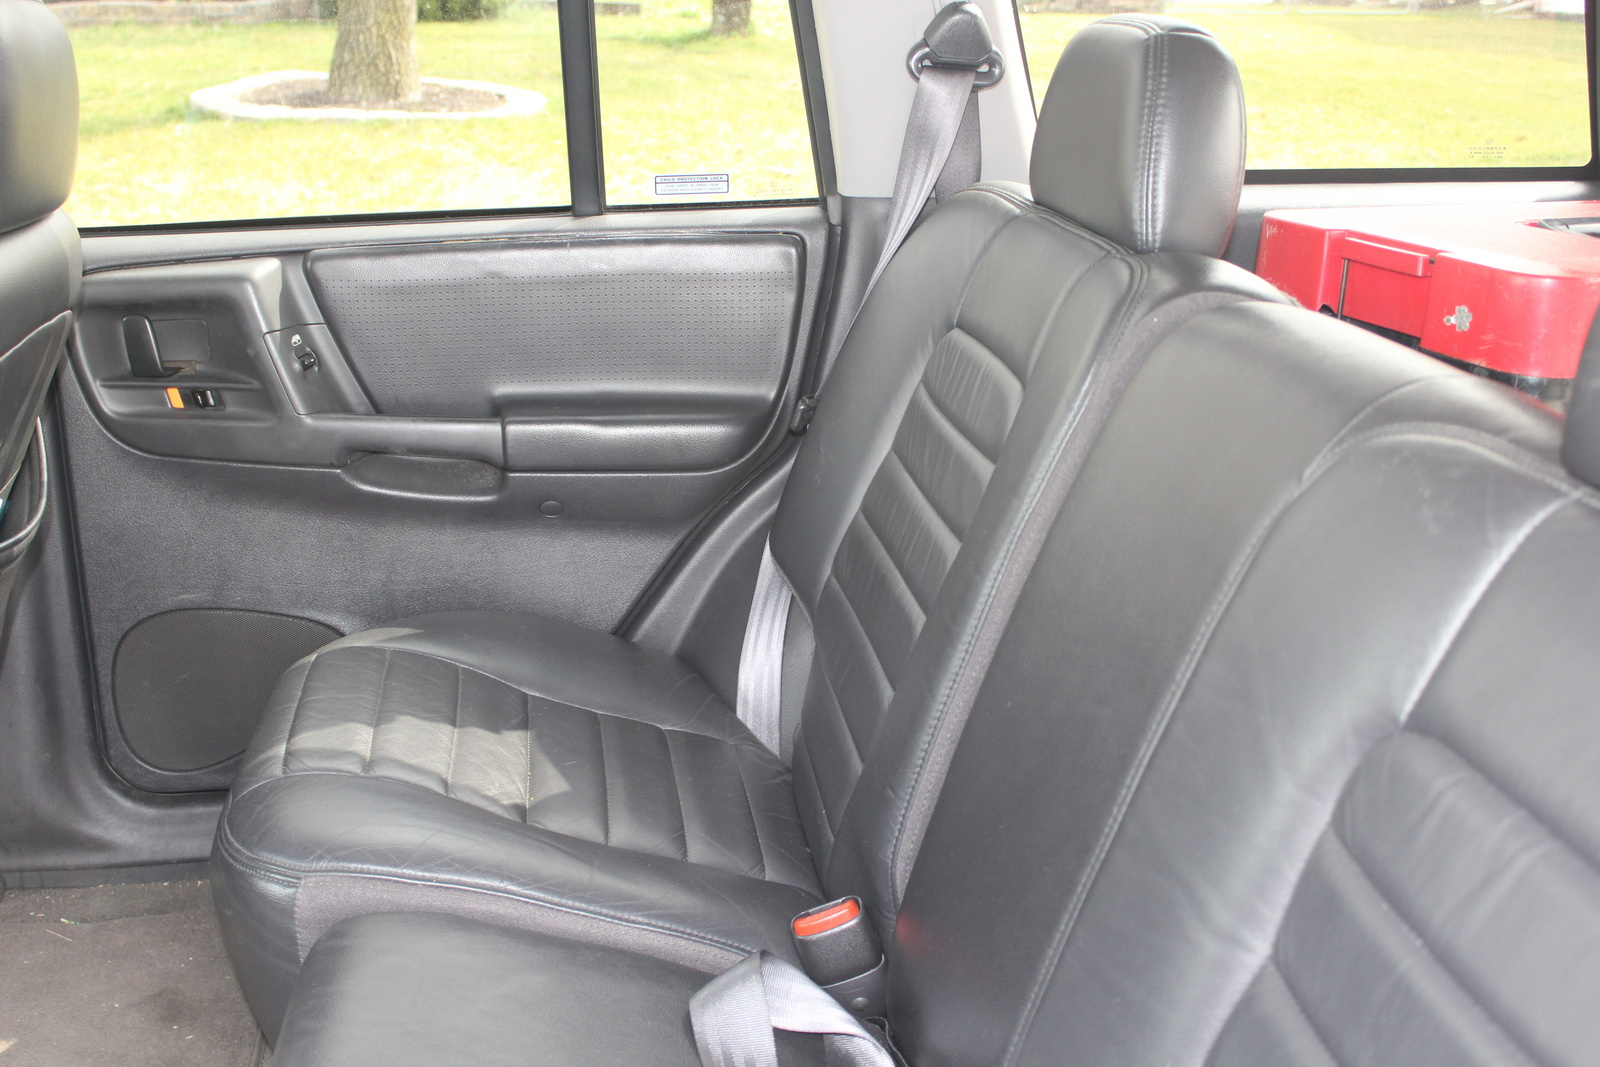 1996 jeep grand cherokee interior pictures cargurus - 1996 jeep grand cherokee interior ...